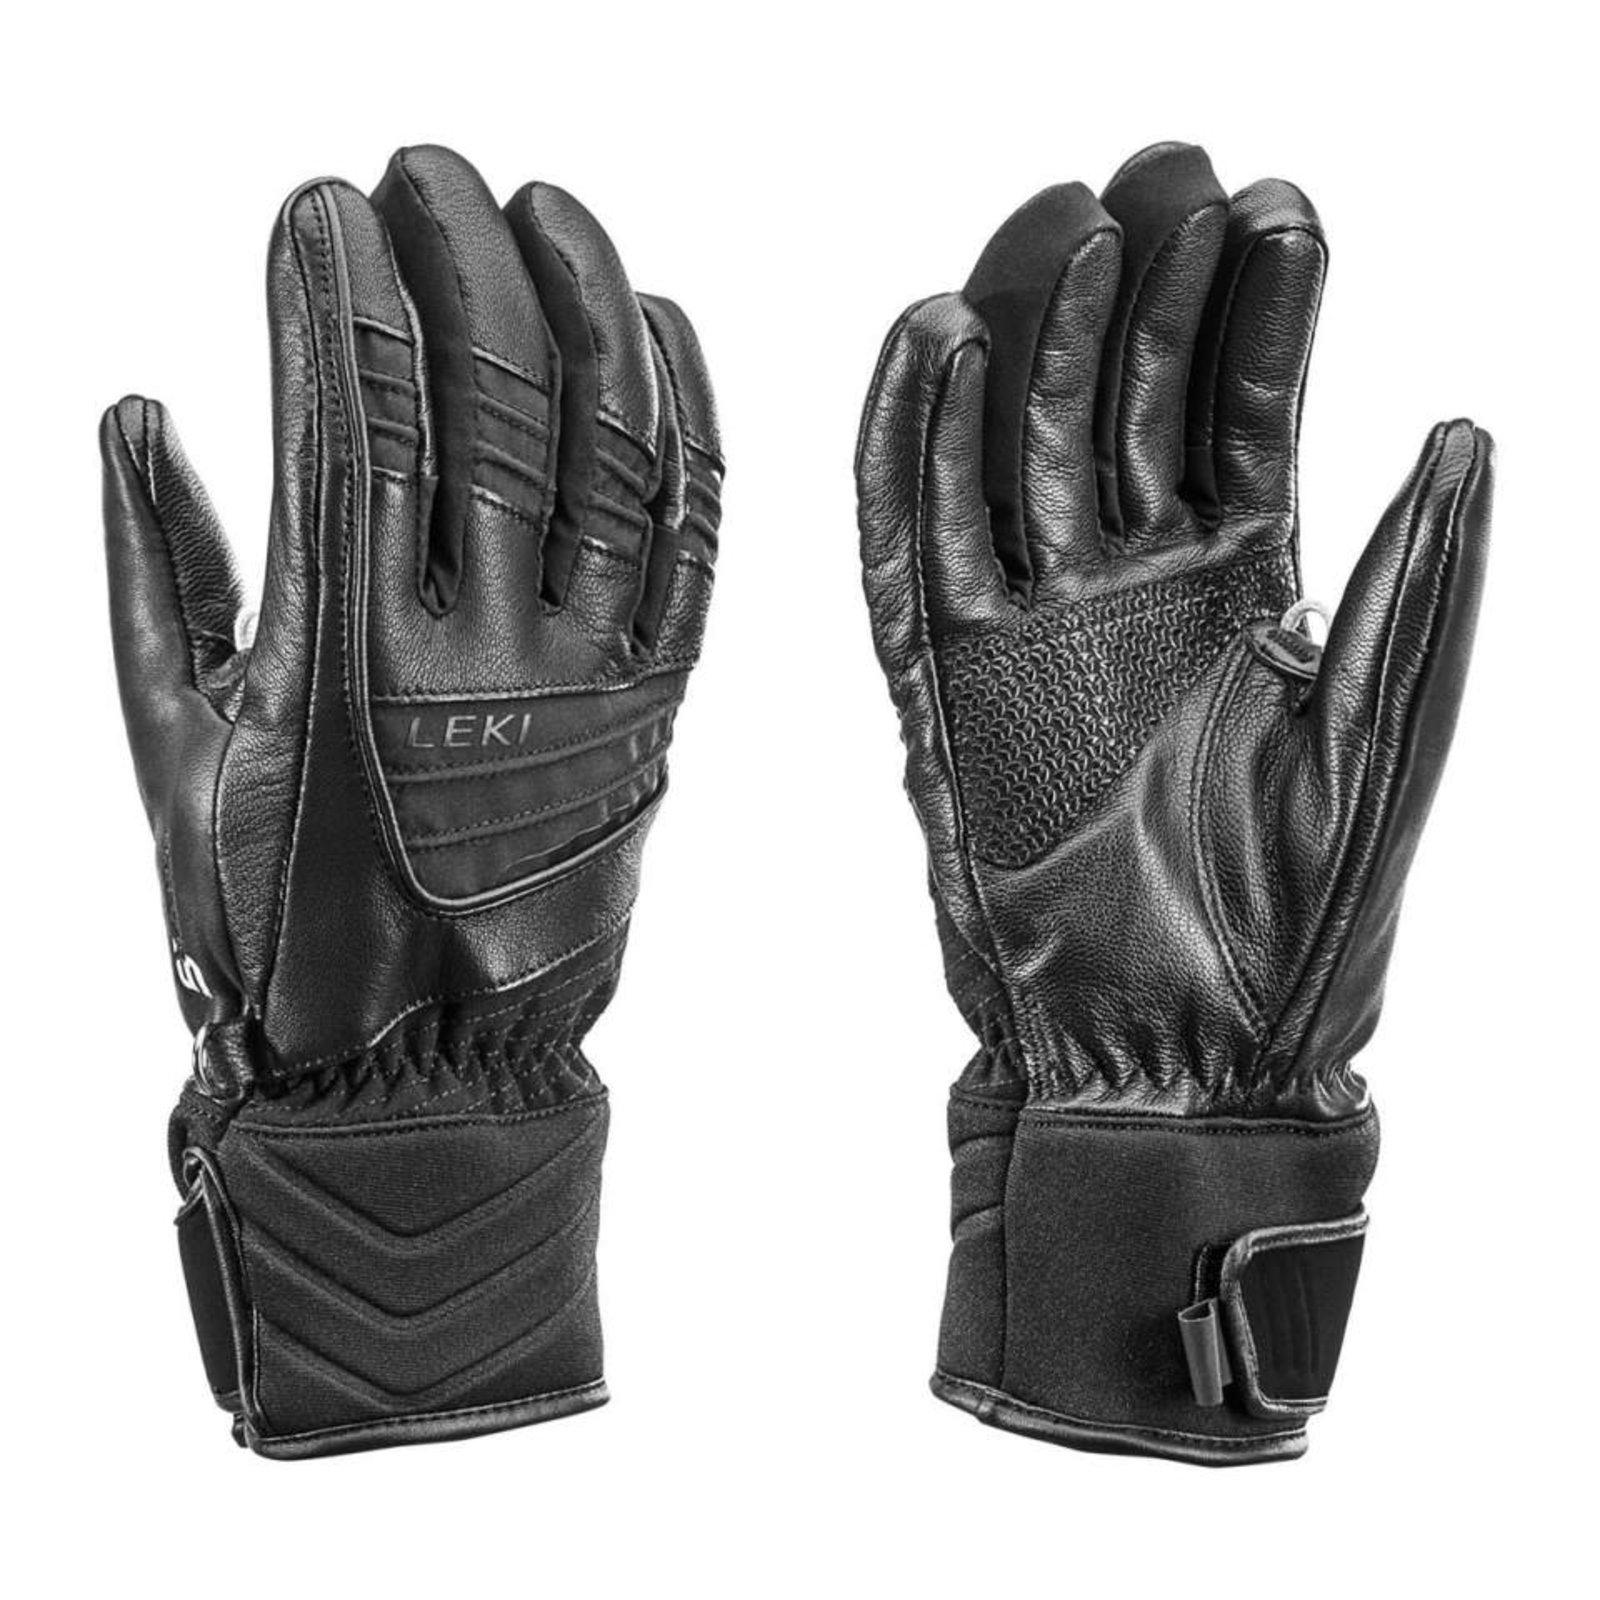 Lyžařské rukavice LEKI GRIFFIN S LADY  673aeffeb2